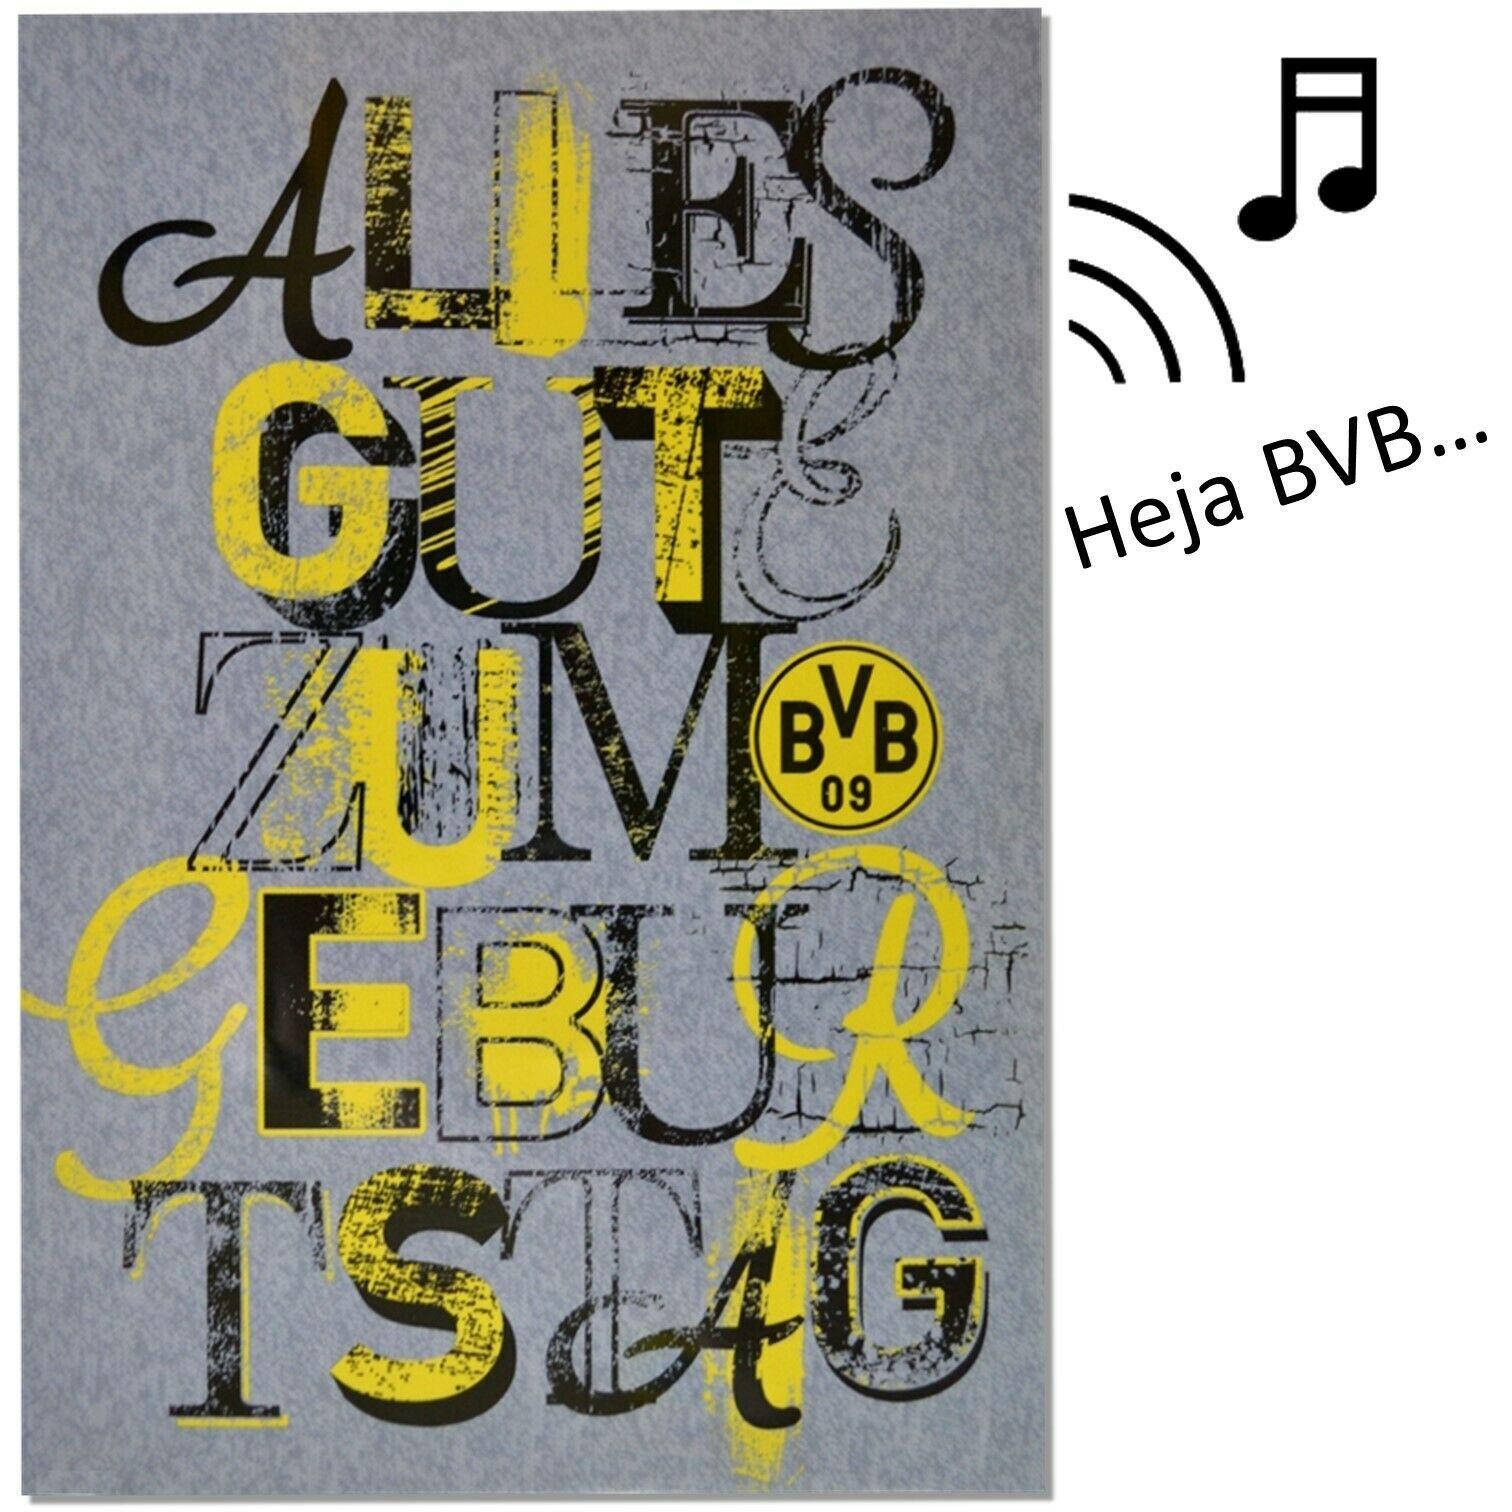 Glückwunschkarte Bvb Borussia Dortmund Geburtstagskarte über Bvb Geburtstagskarte